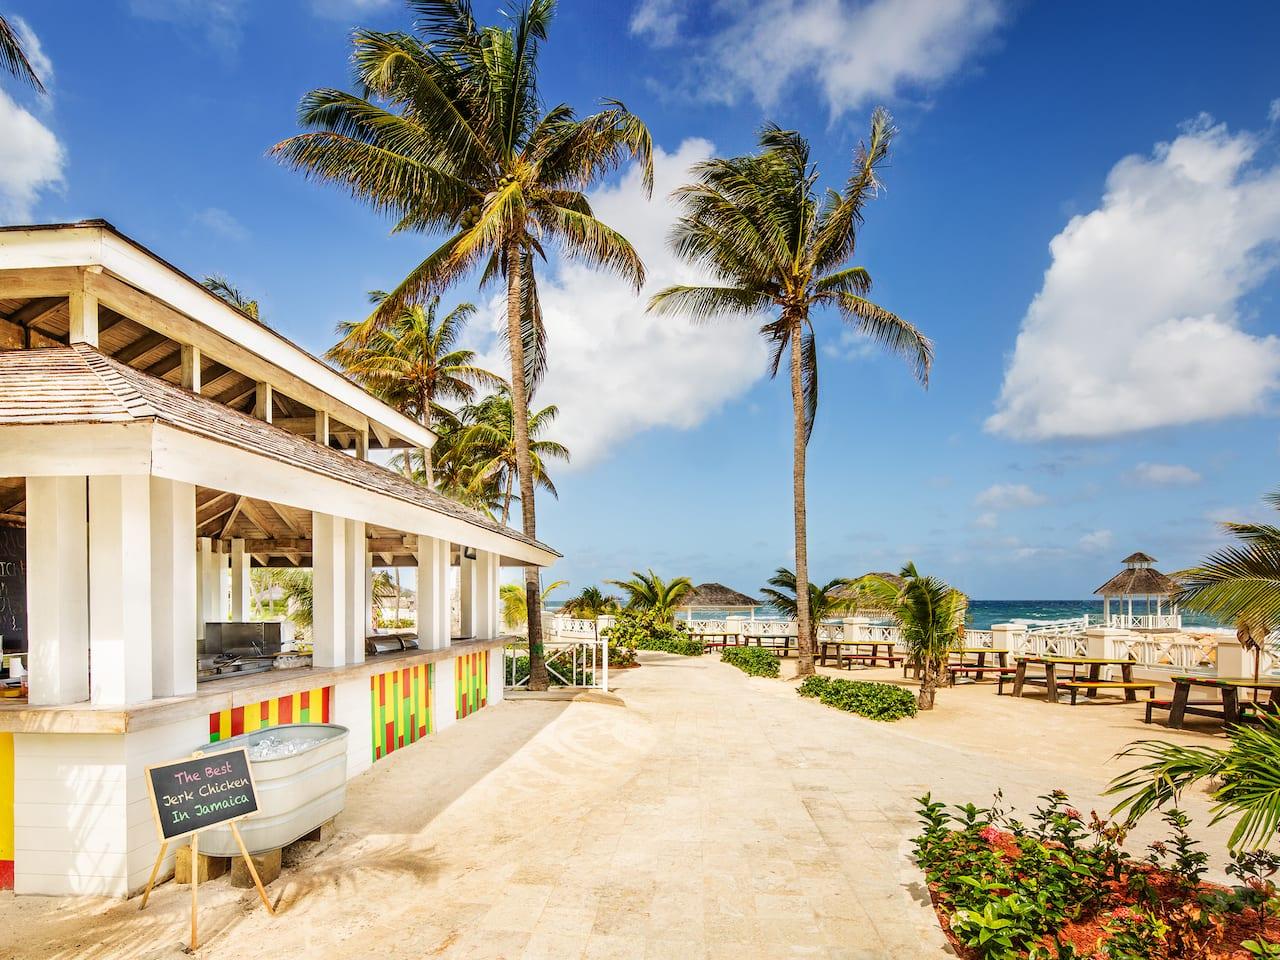 Barefoot Jerkz Beach Restaurant